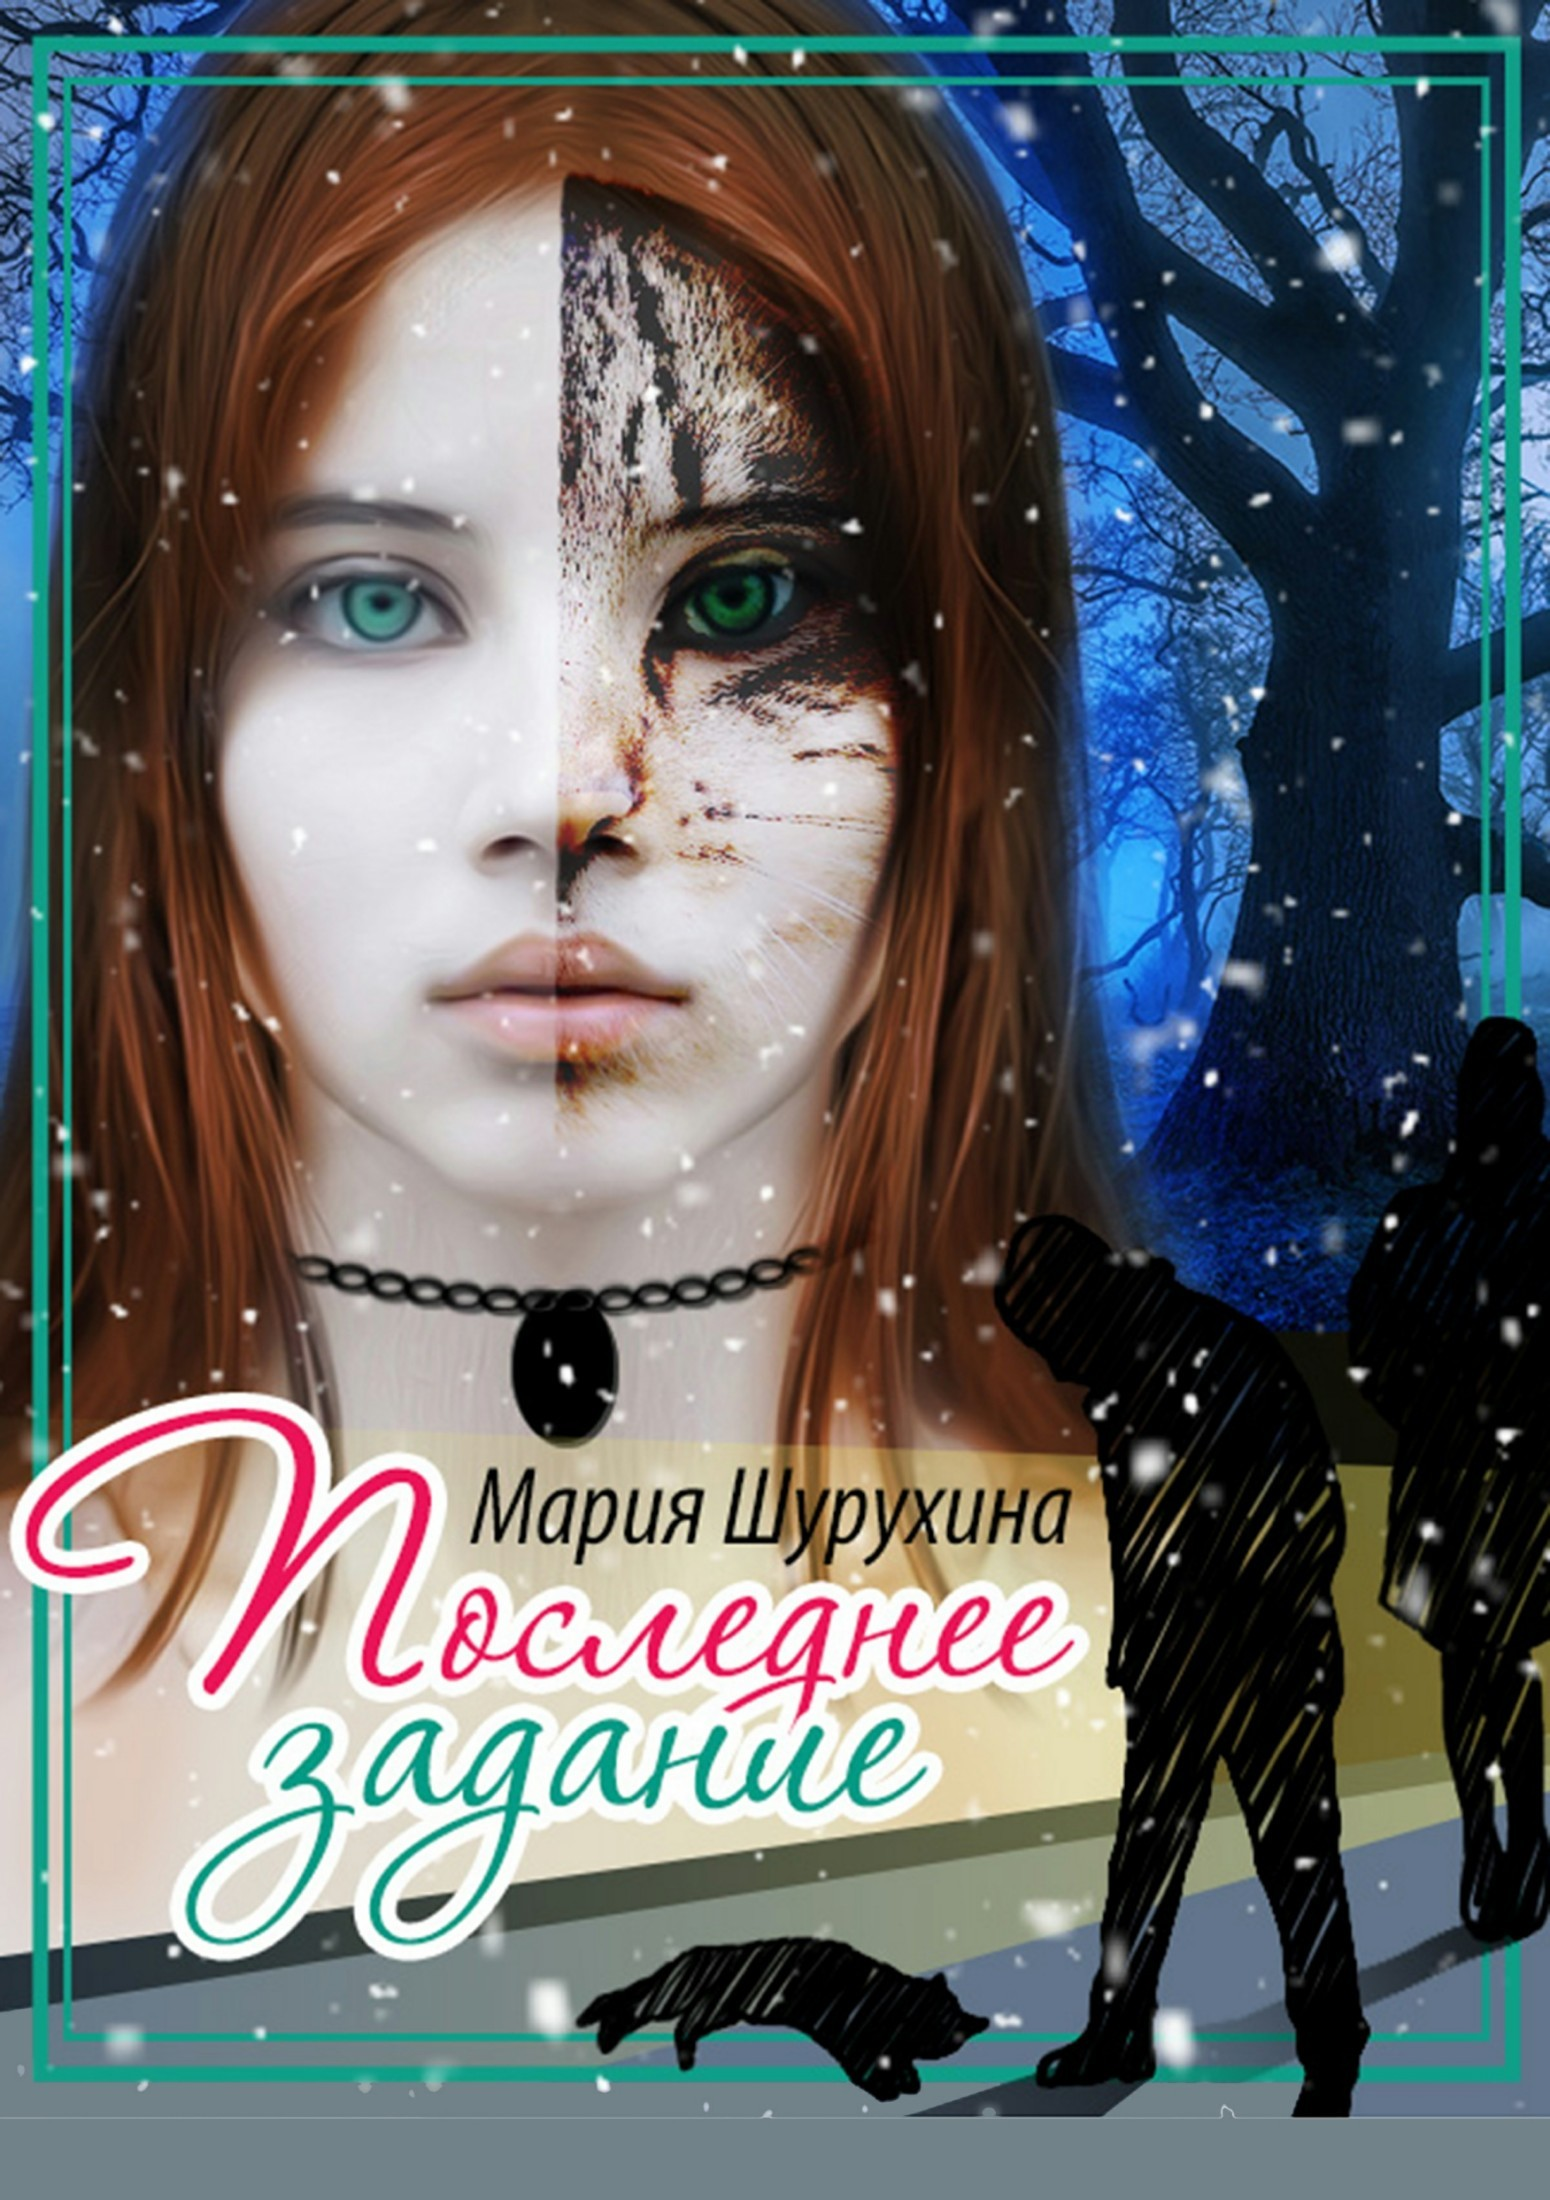 Мария Александровна Шурухина. Последнее задание